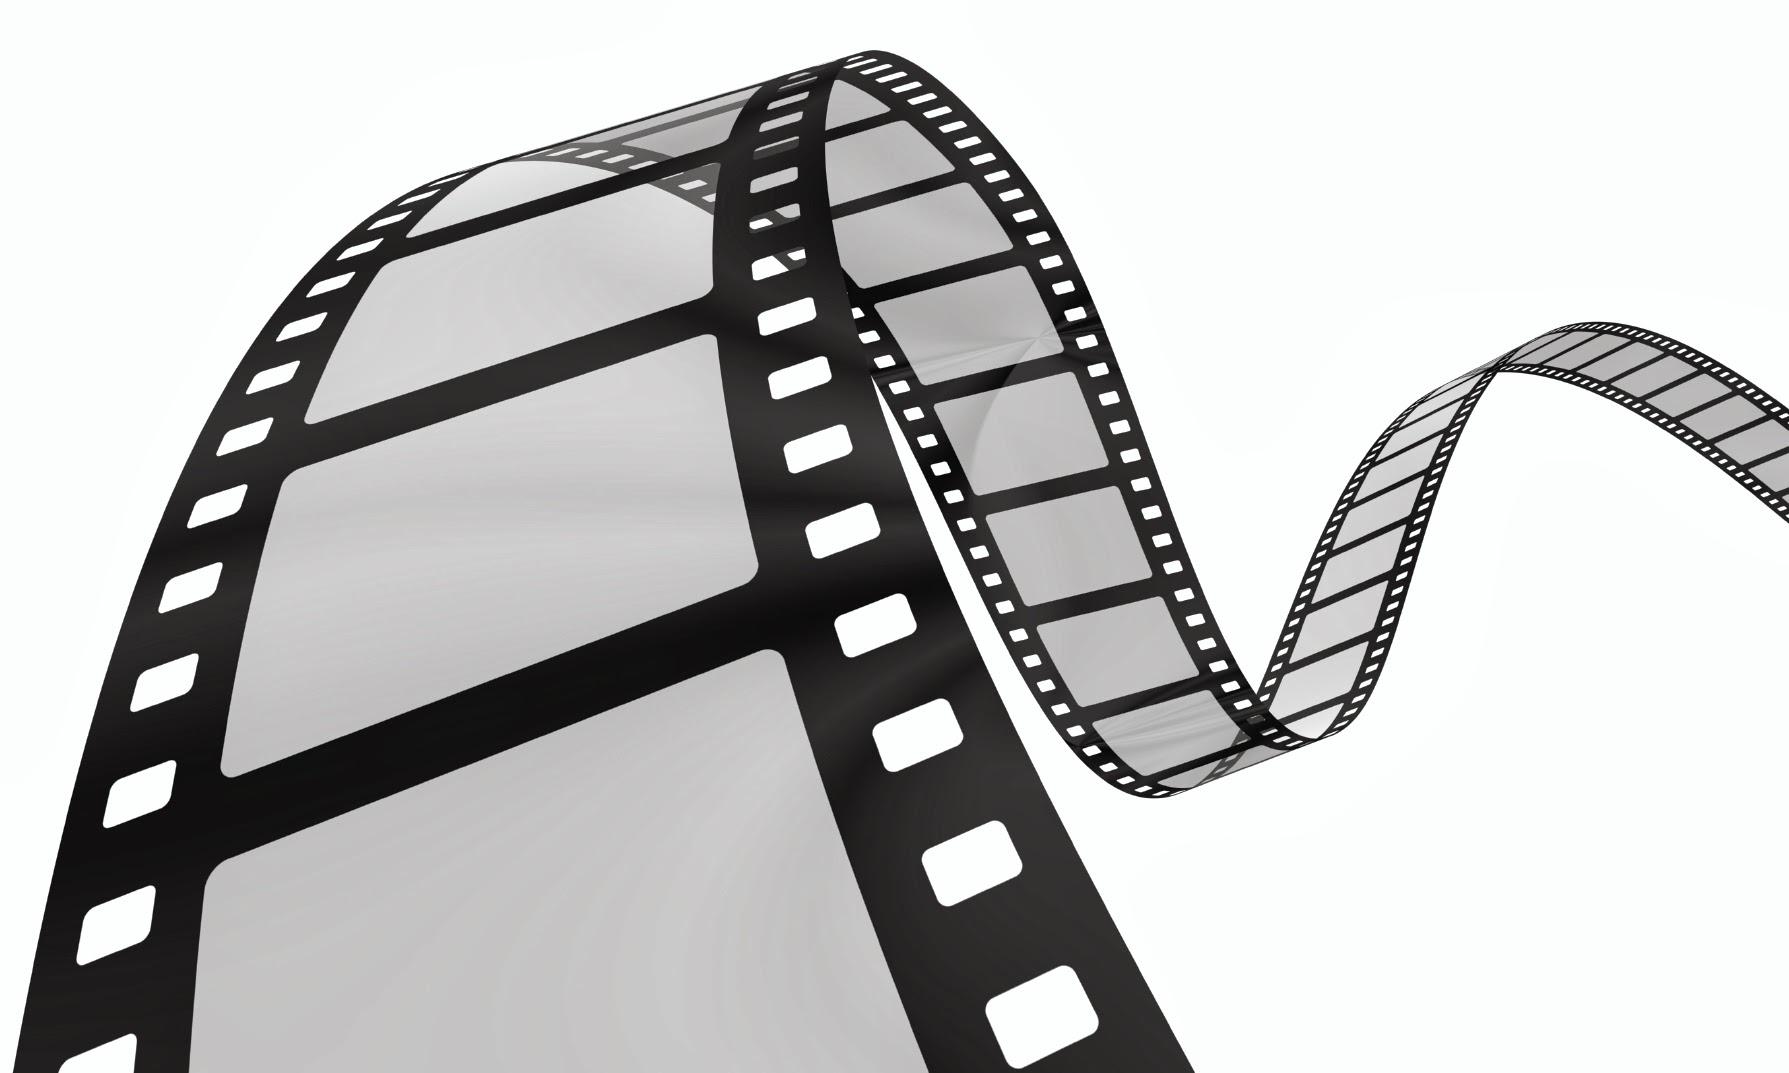 clipart pellicola cinematografica - photo #48